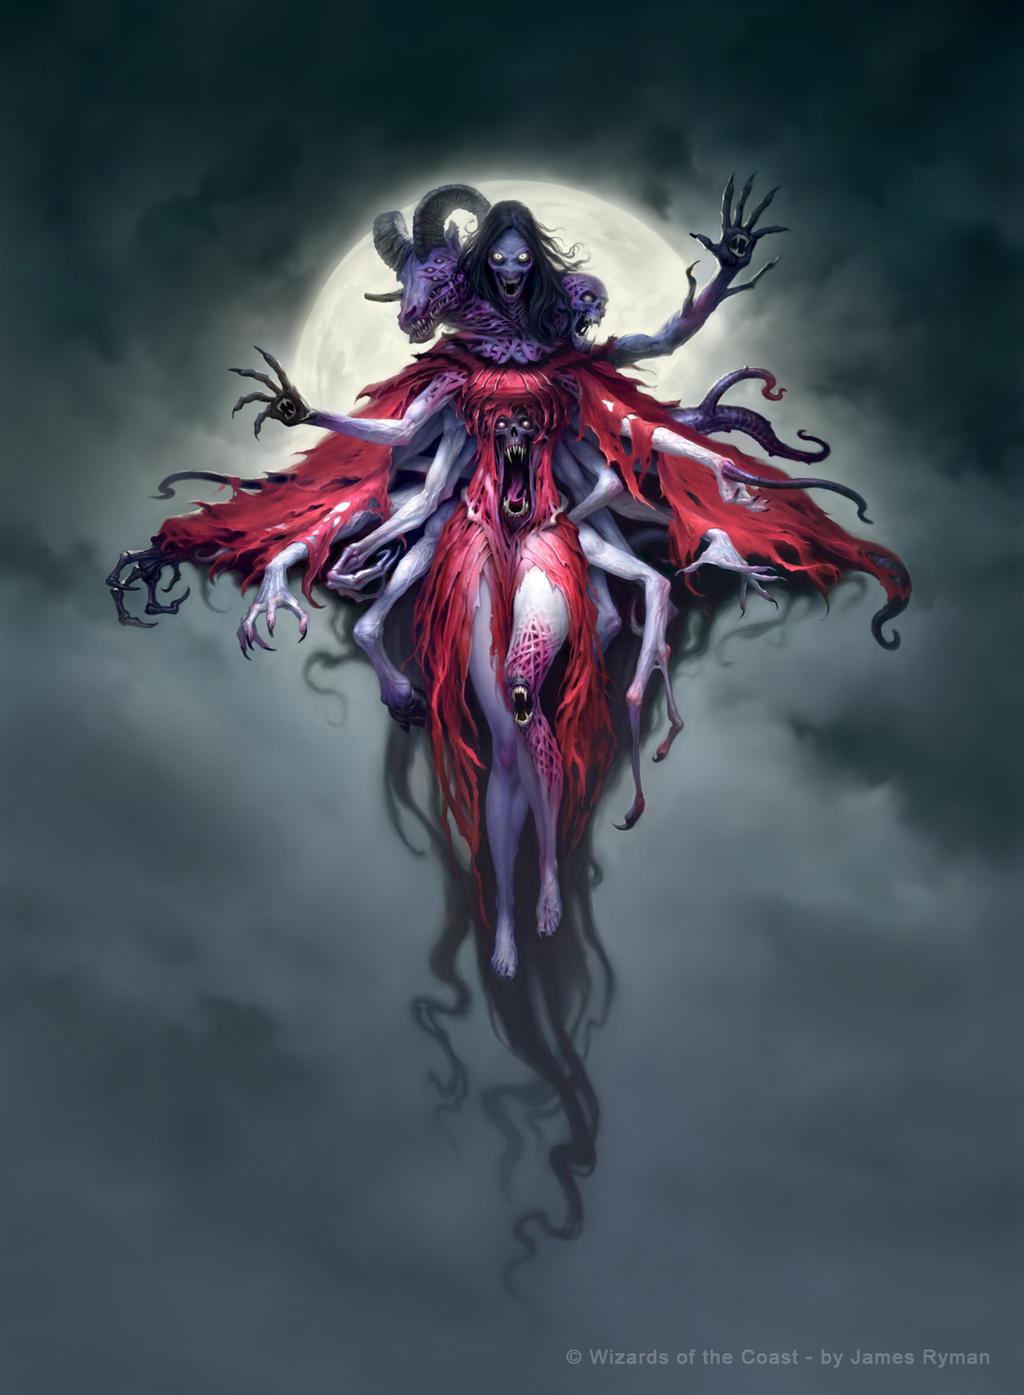 MtG: Eldritch Moon - Abolisher of Bloodlines